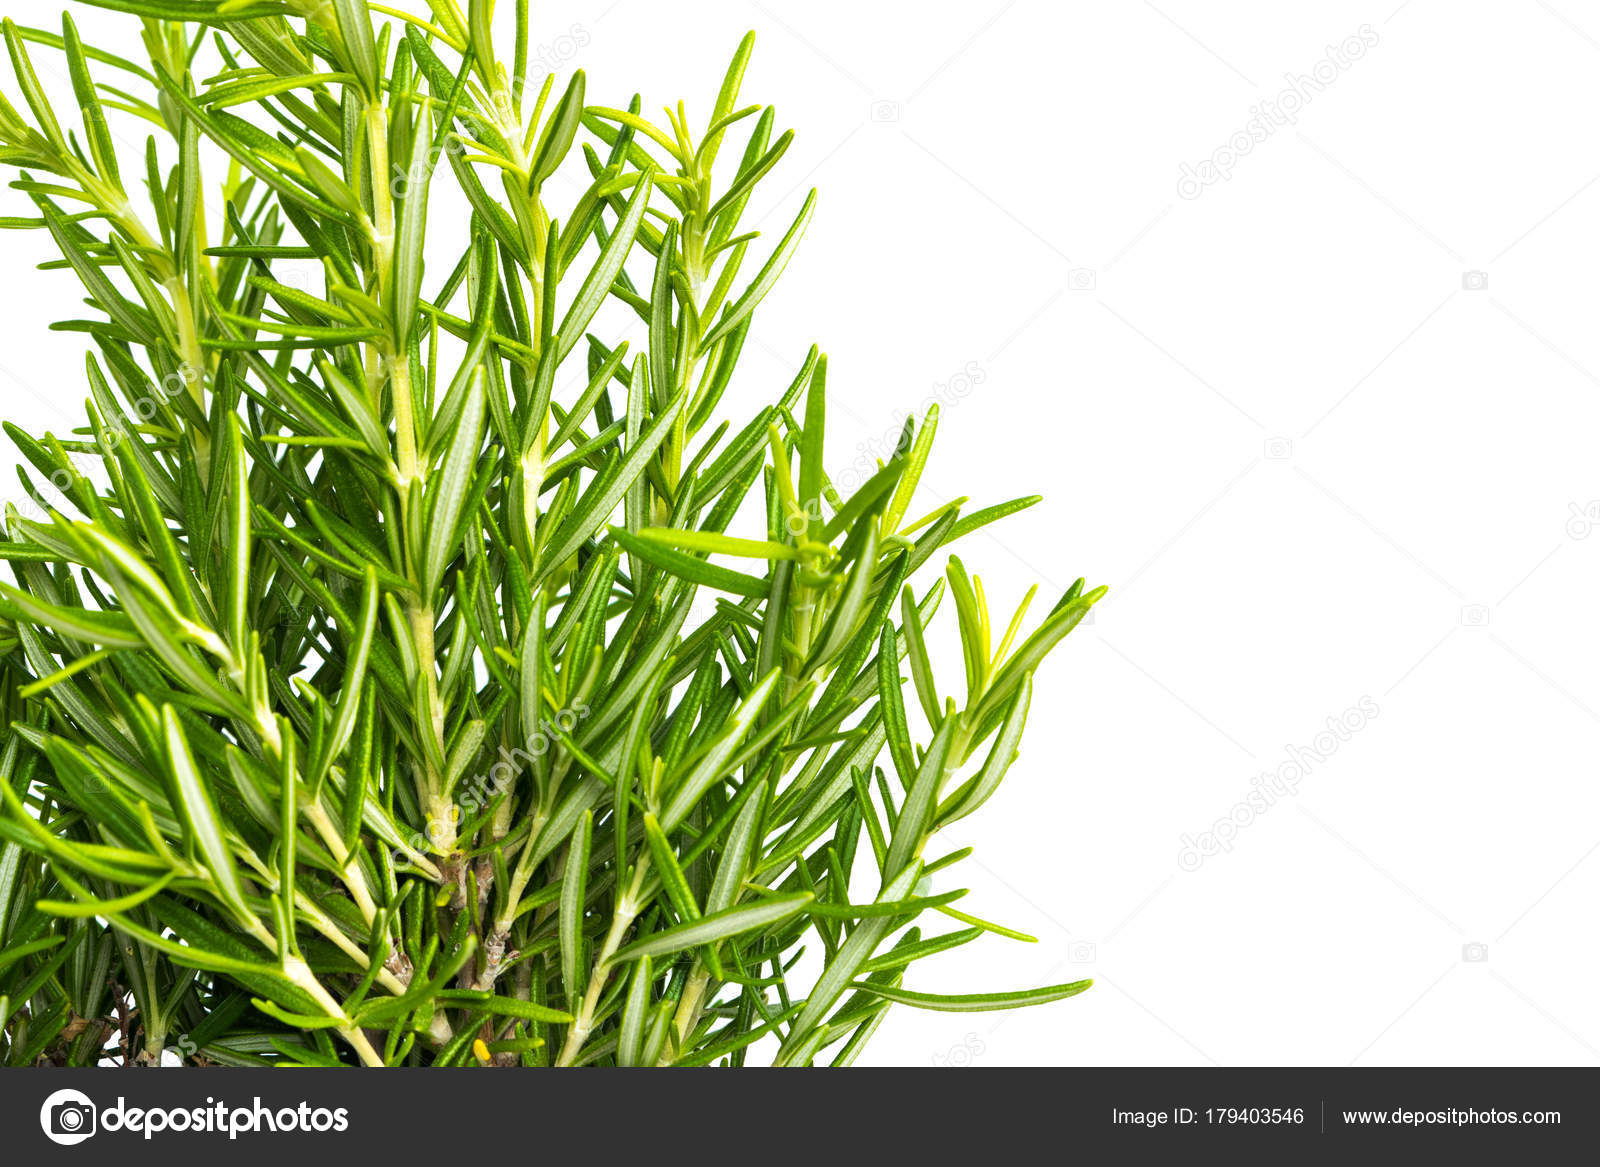 herbe de thym frais. plantes de thym frais arômes biologiques de